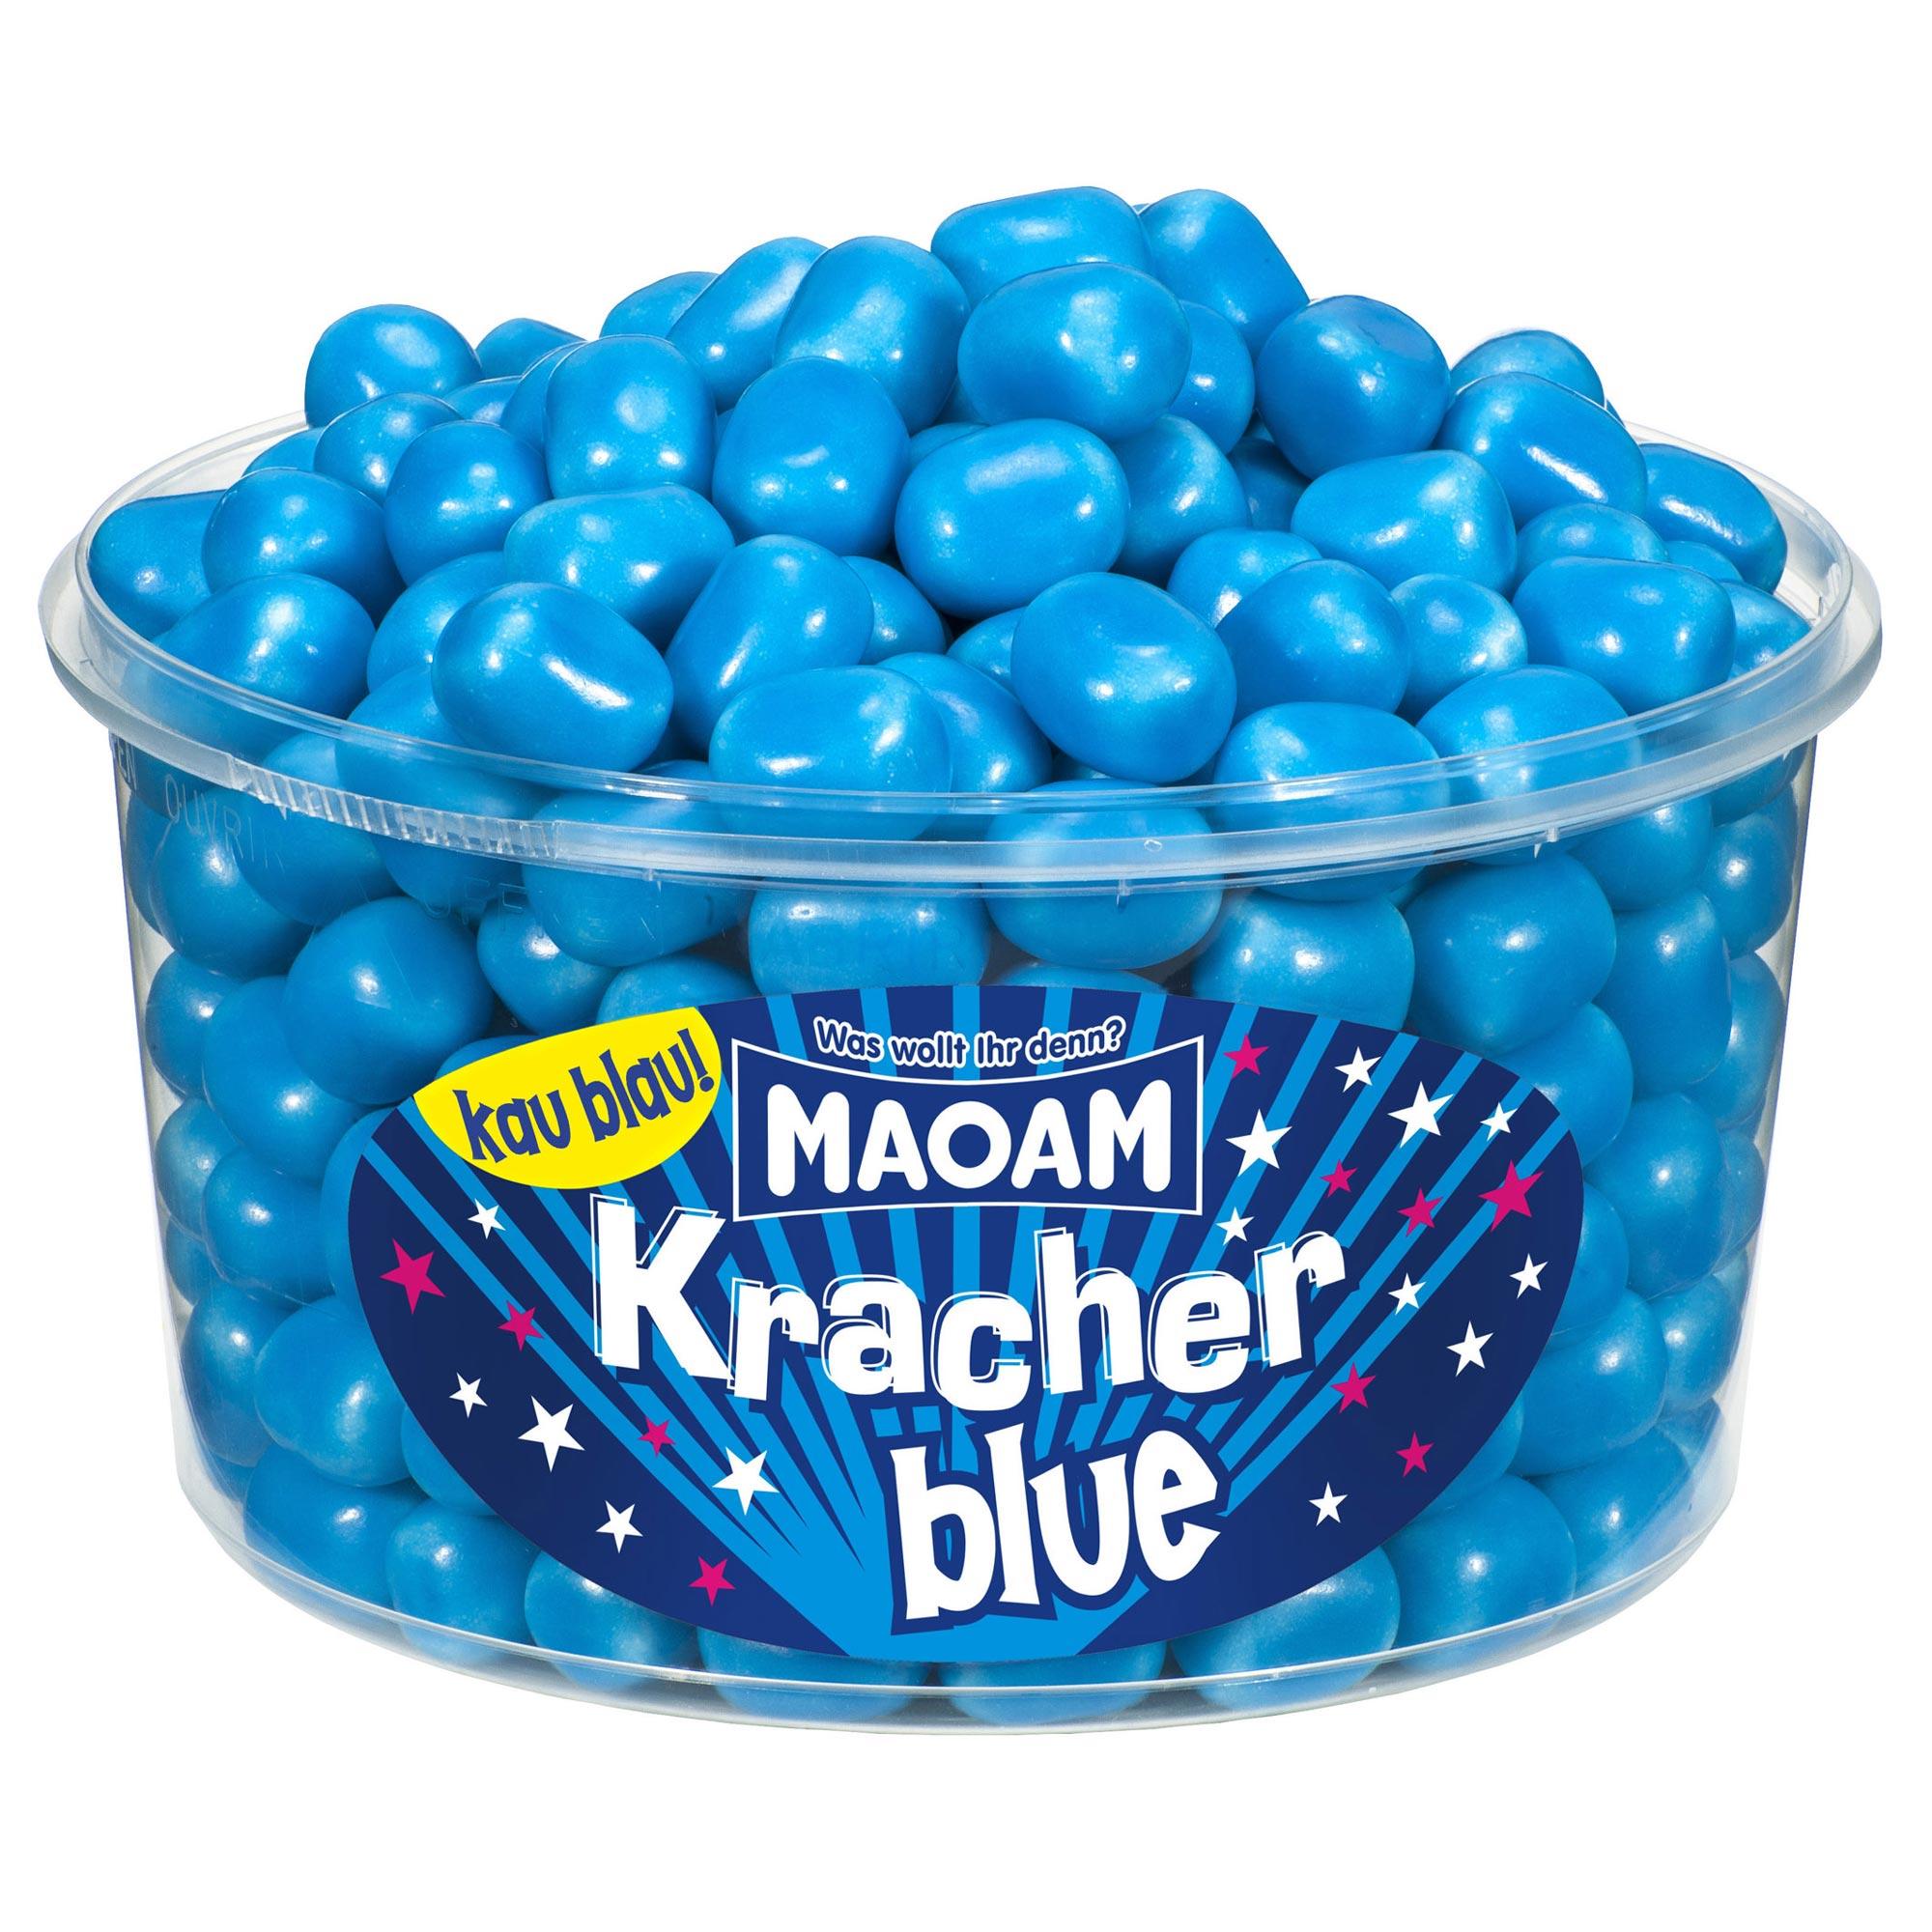 Maoam Kracher Blau